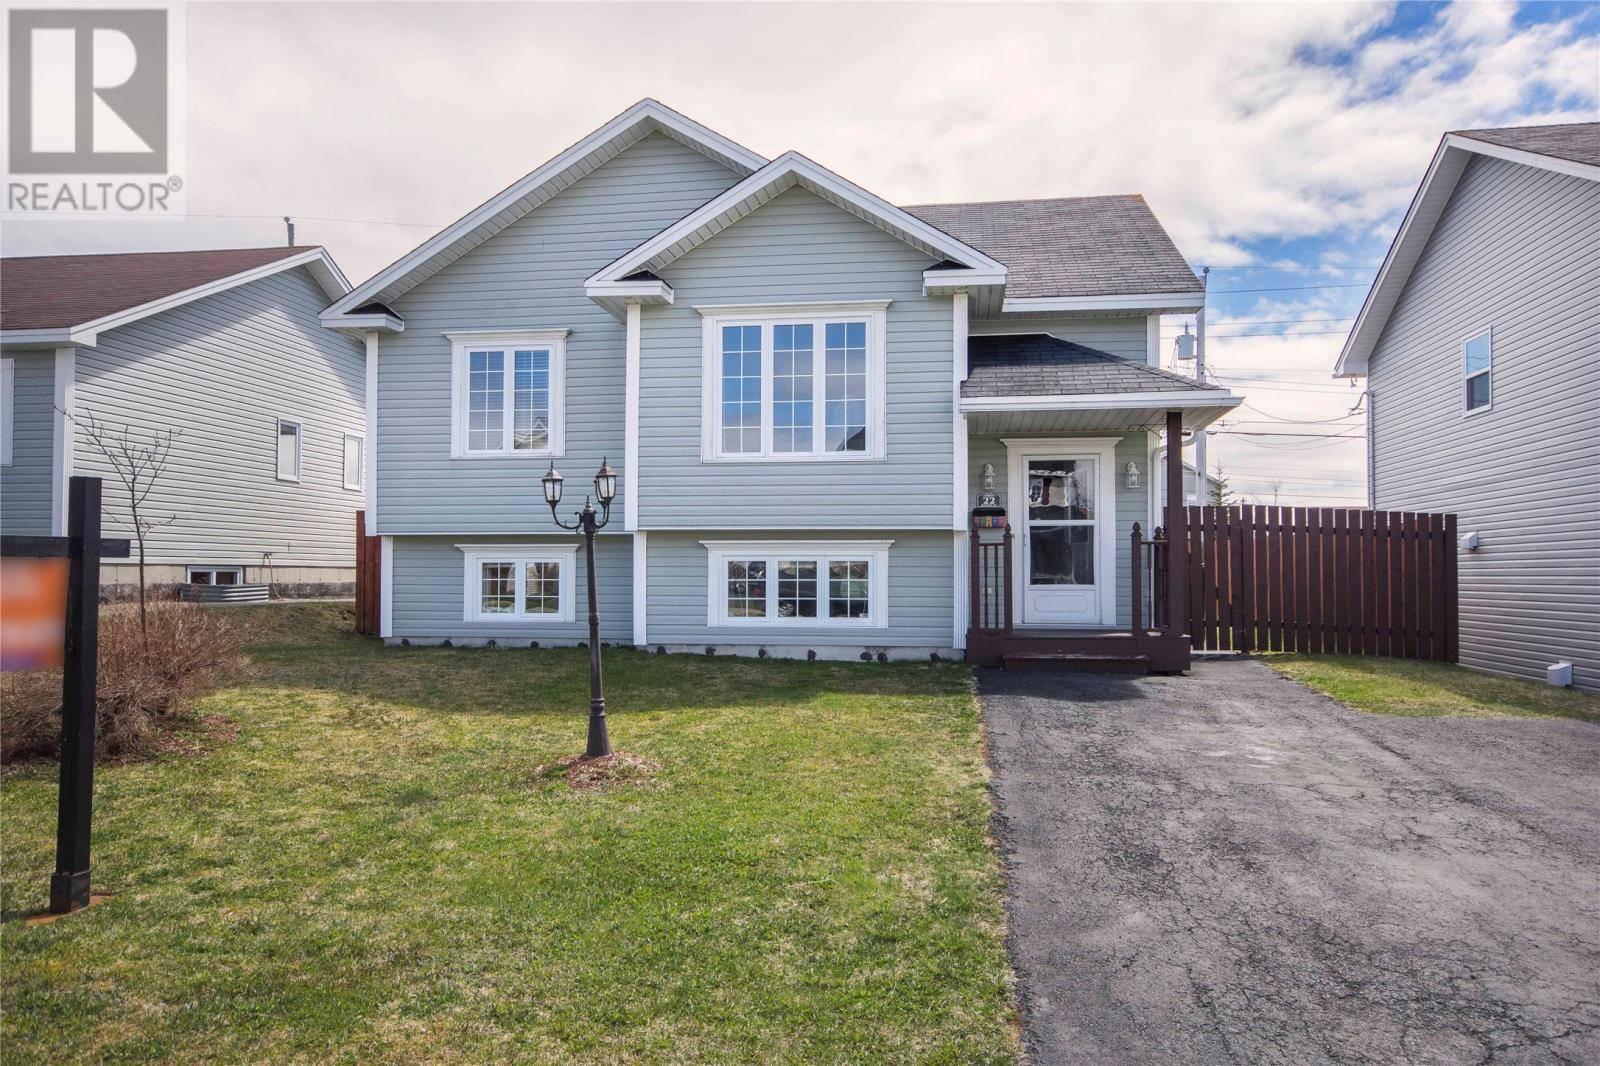 House for sale at 22 Kinkora St Paradise Newfoundland - MLS: 1200251